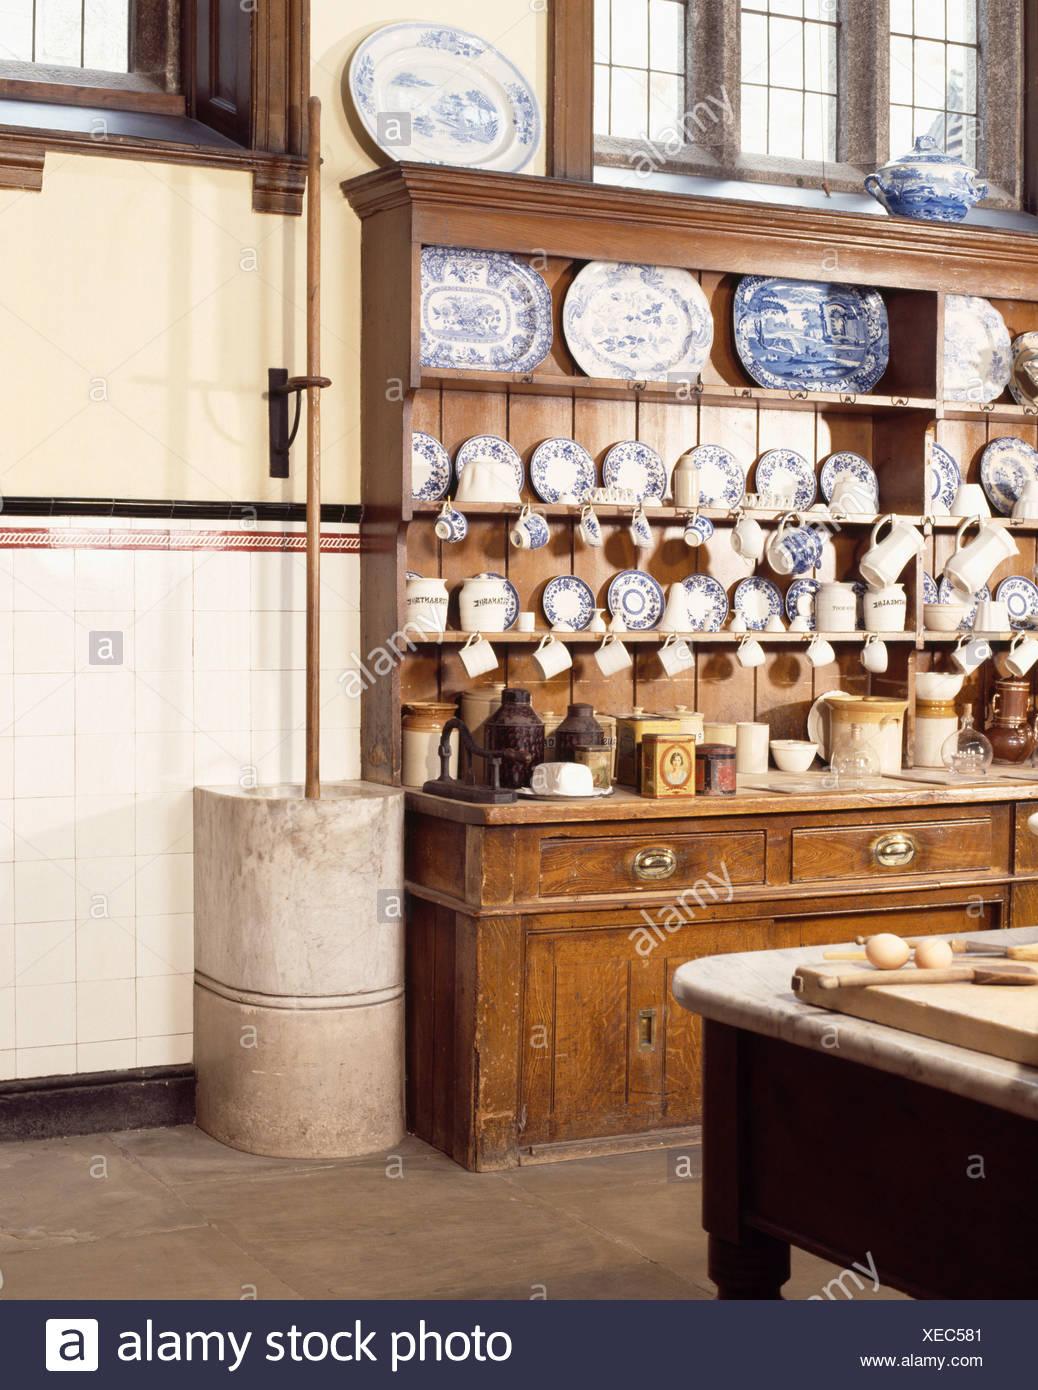 Antike Küche   Grosse Antike Kommode Mit Platten In Den Regalen Im Edwardian